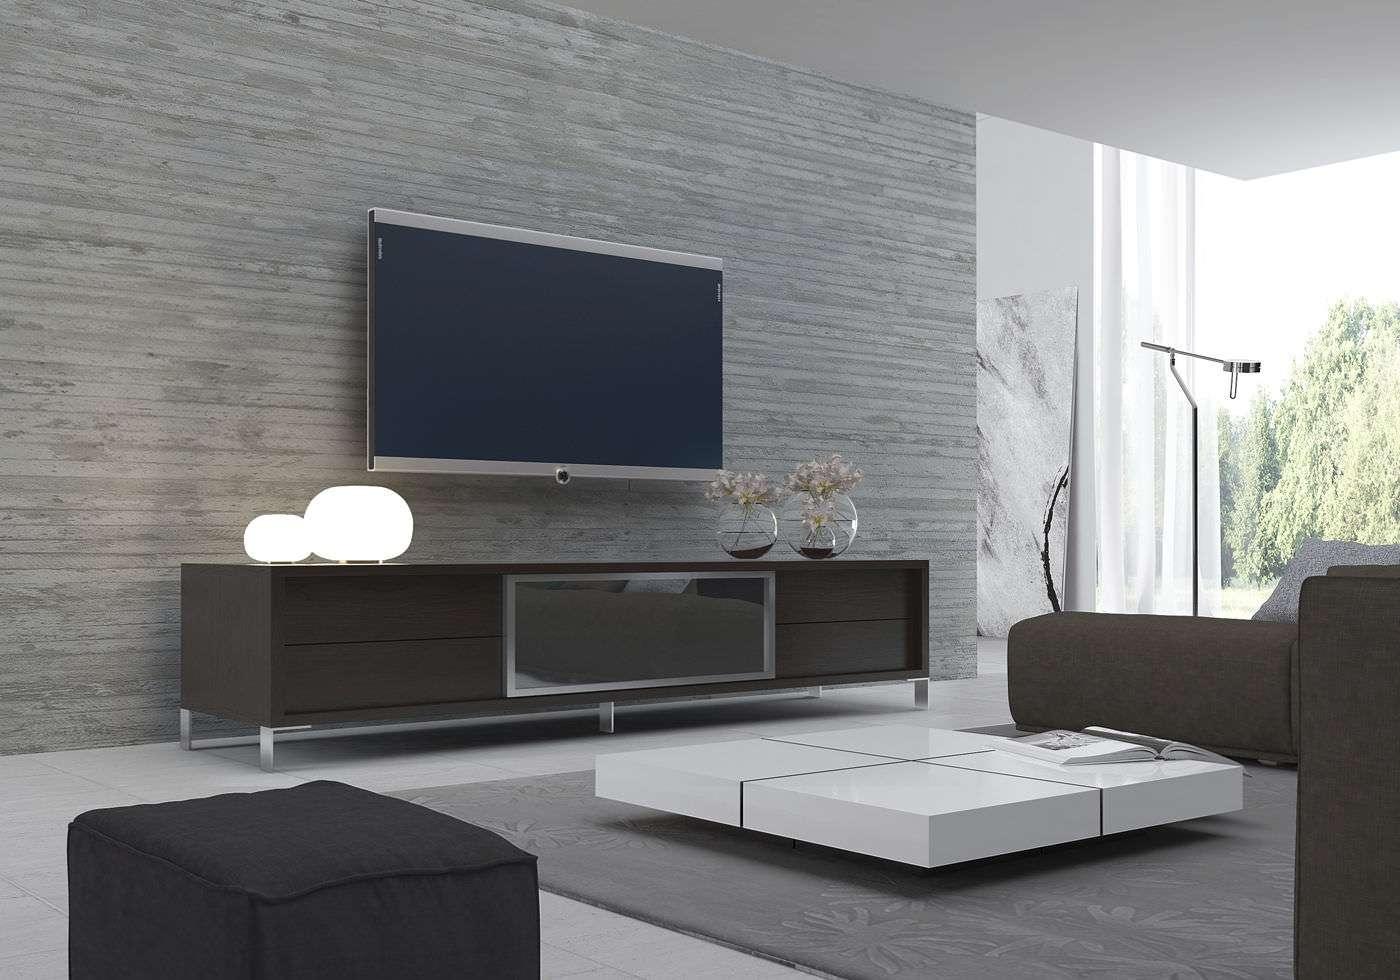 Contemporary Tv Cabinet / Wooden – Lexington – Modloft With Regard To Modern Tv Cabinets (View 12 of 20)